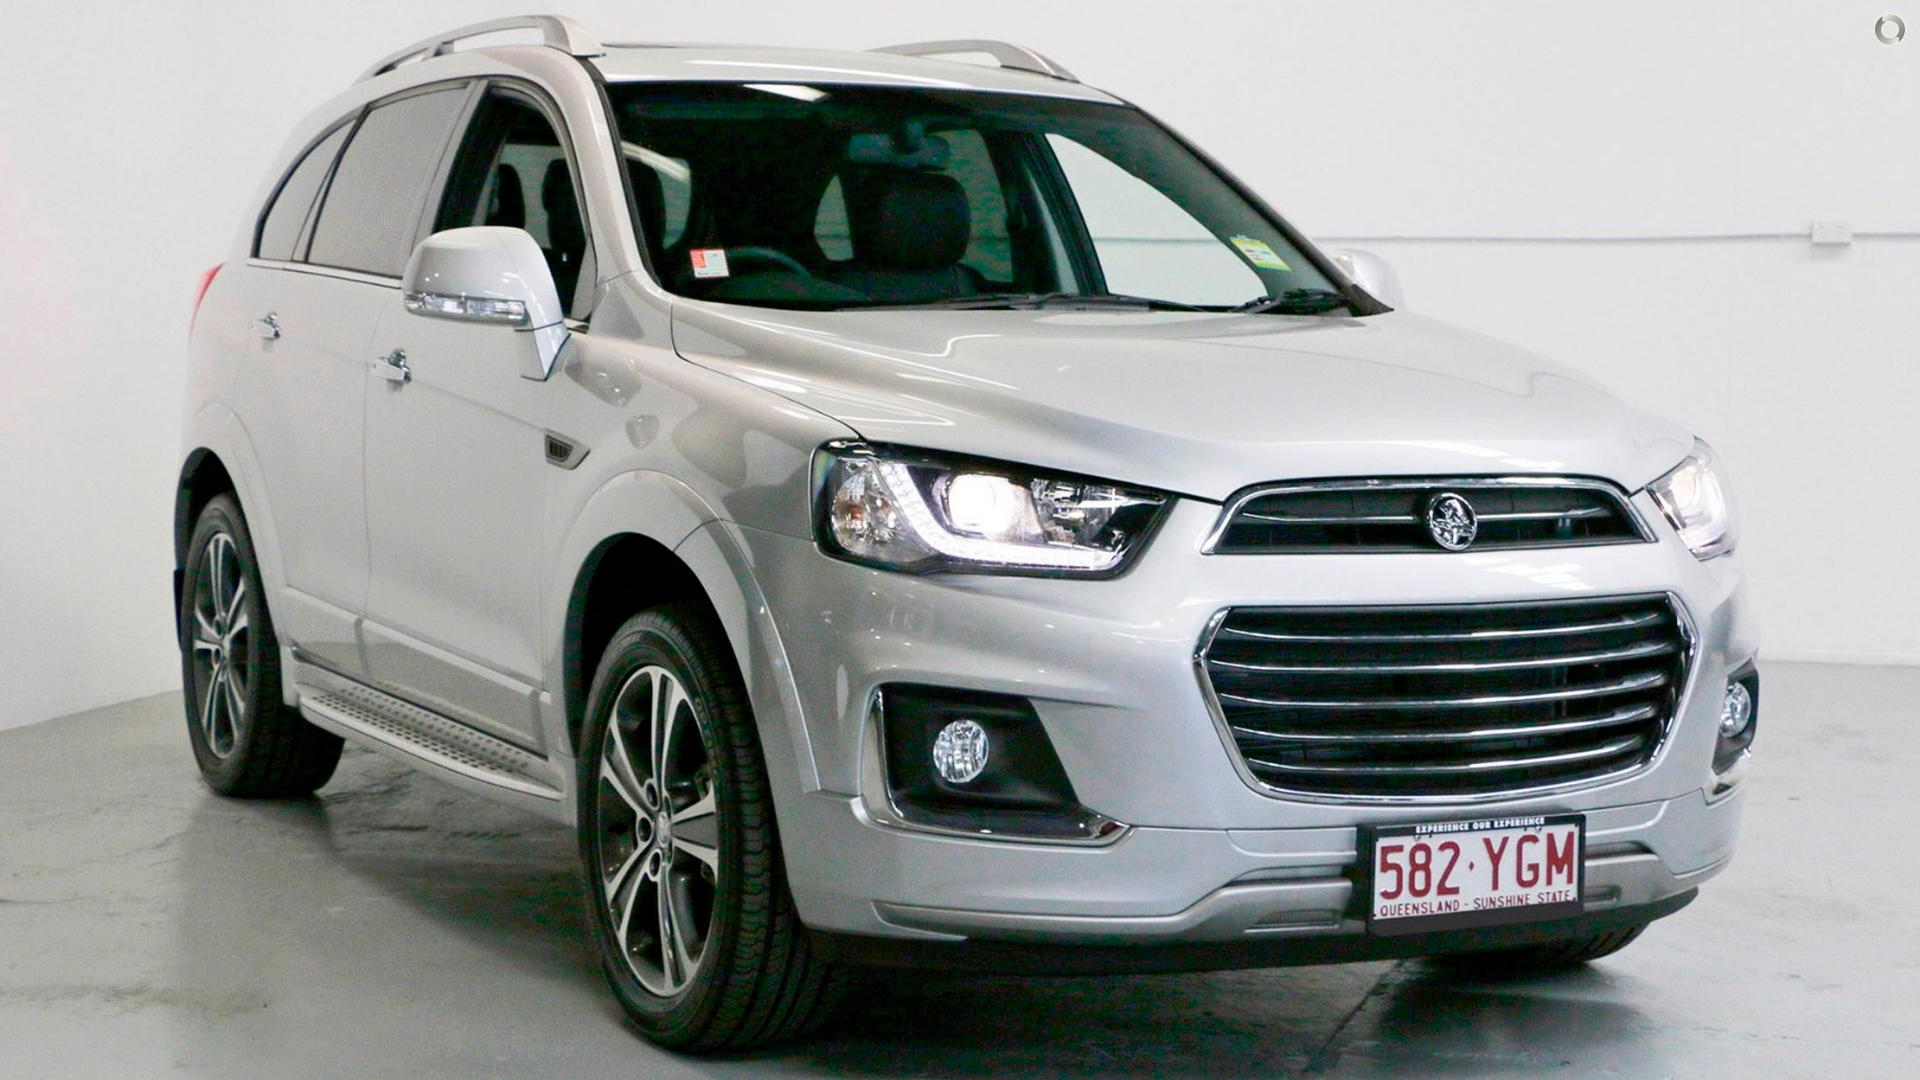 2018 Holden Captiva Ltz